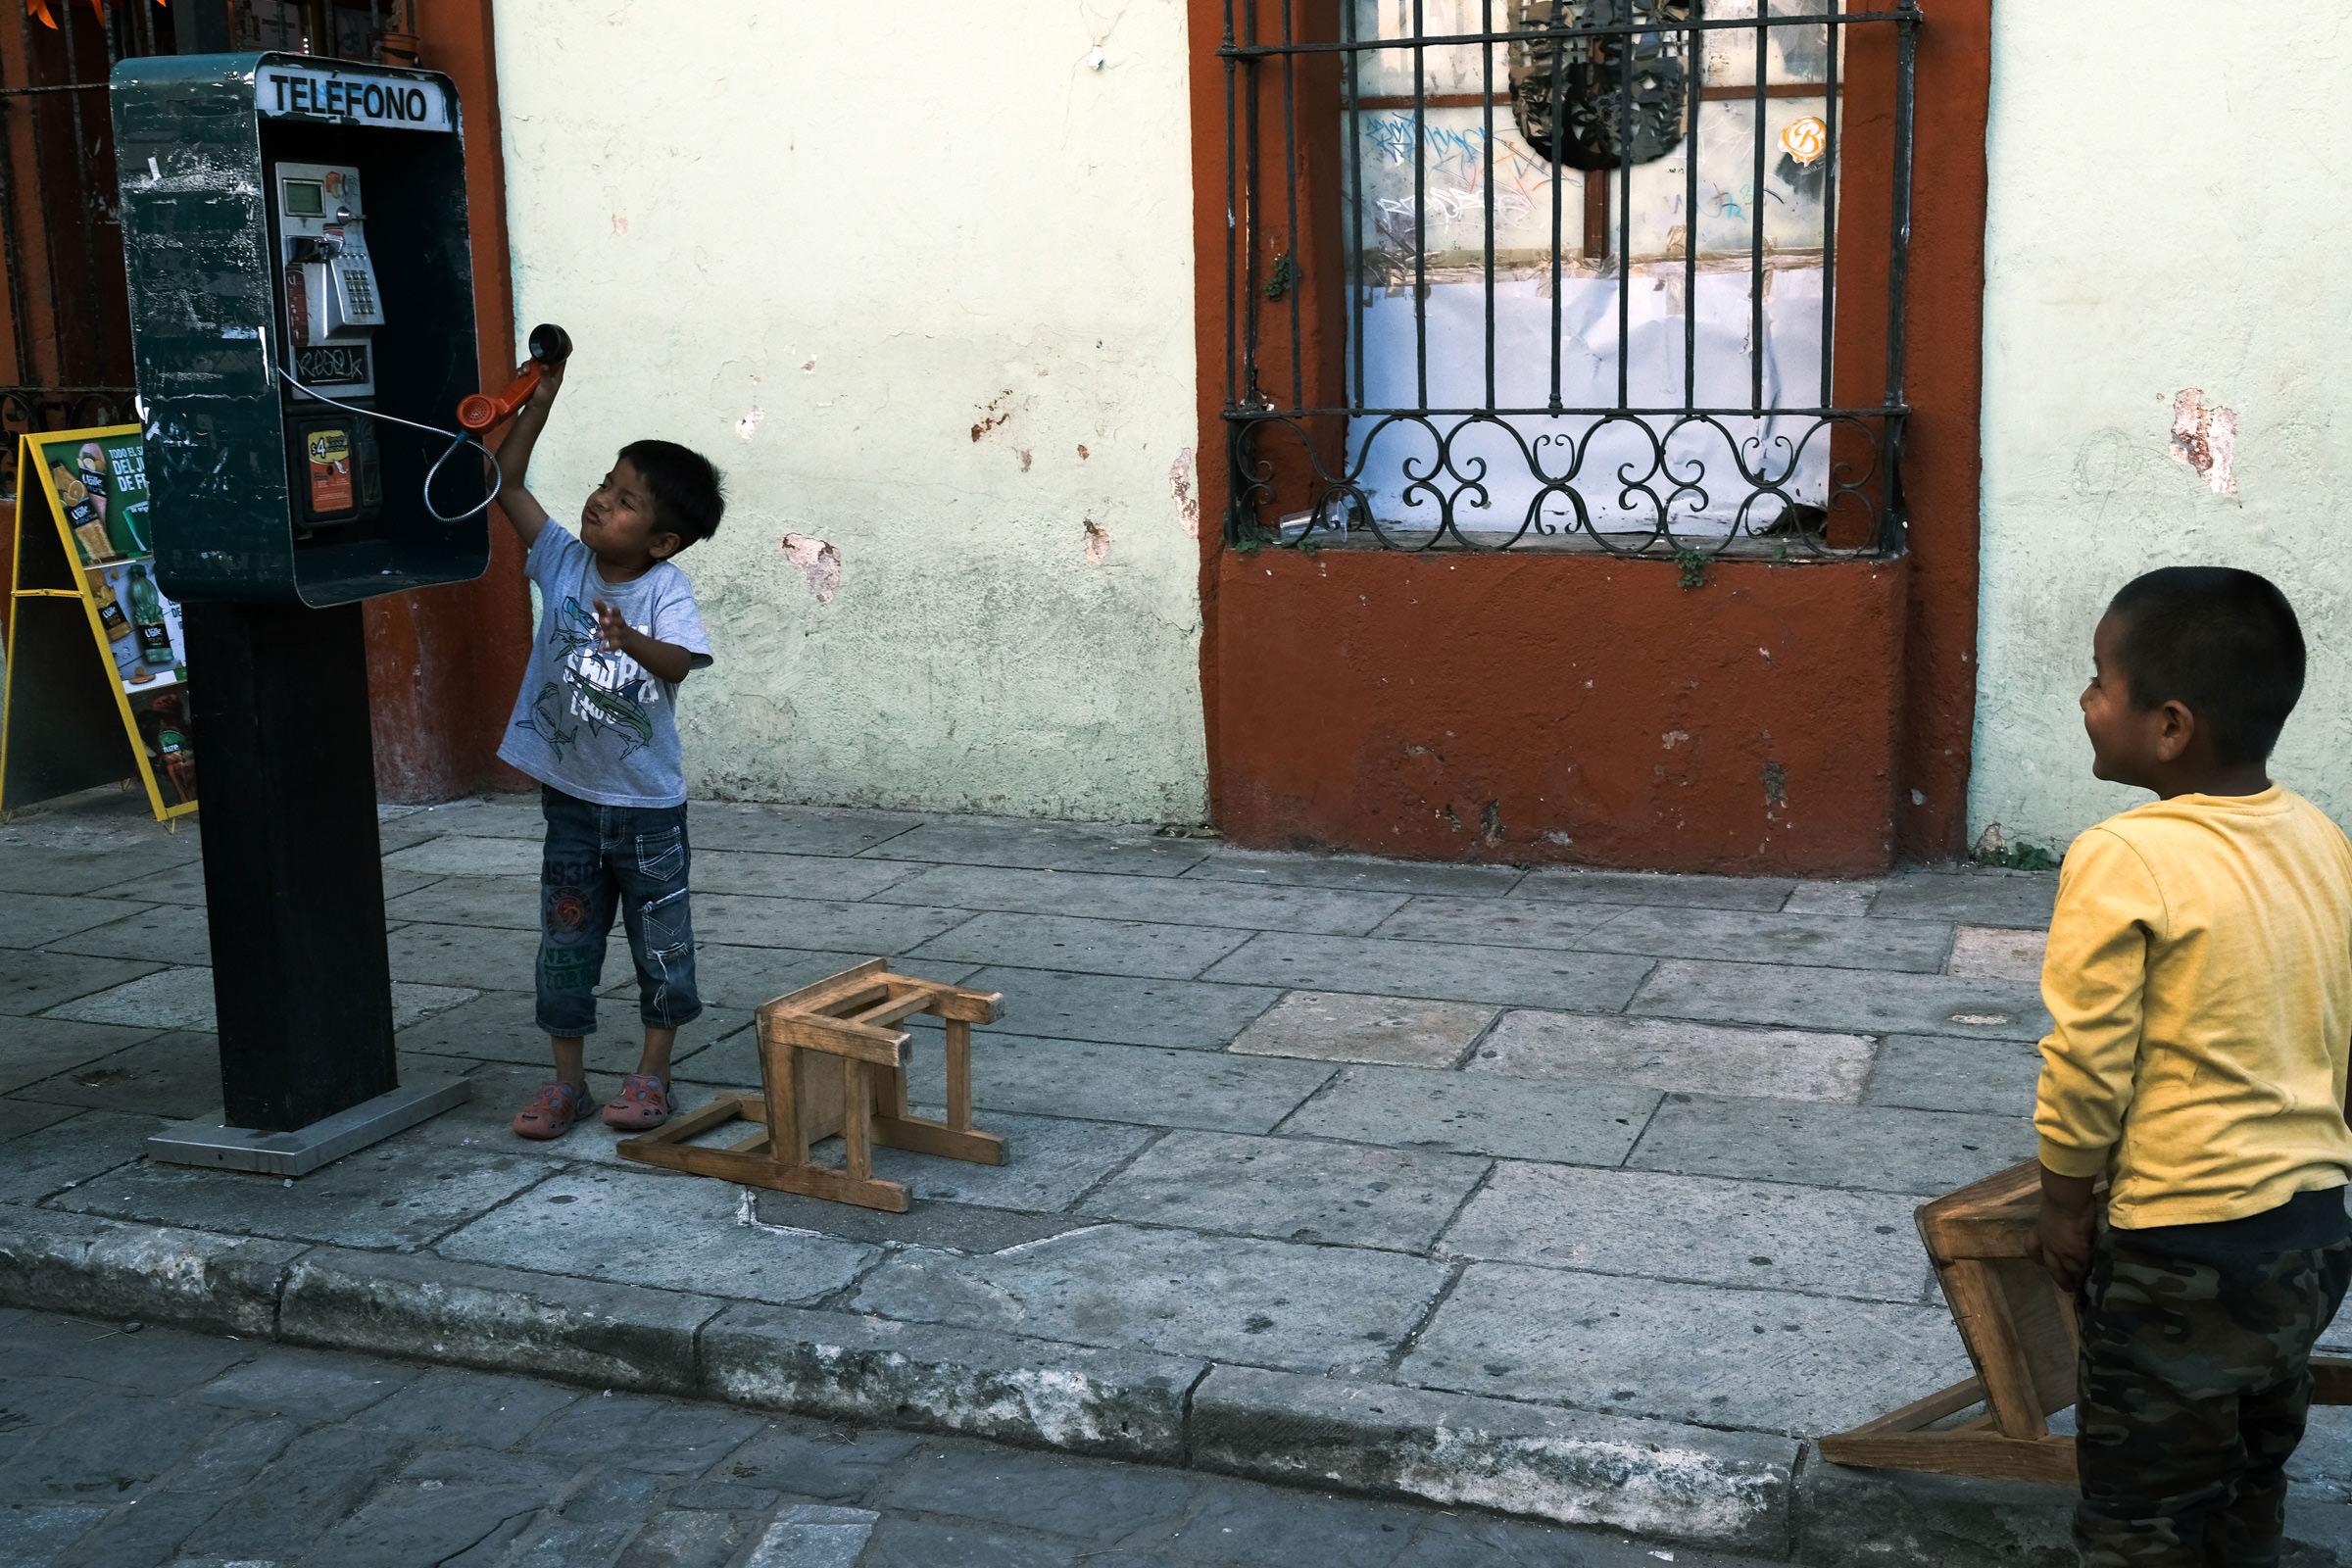 Mexico-Street-Photography-25